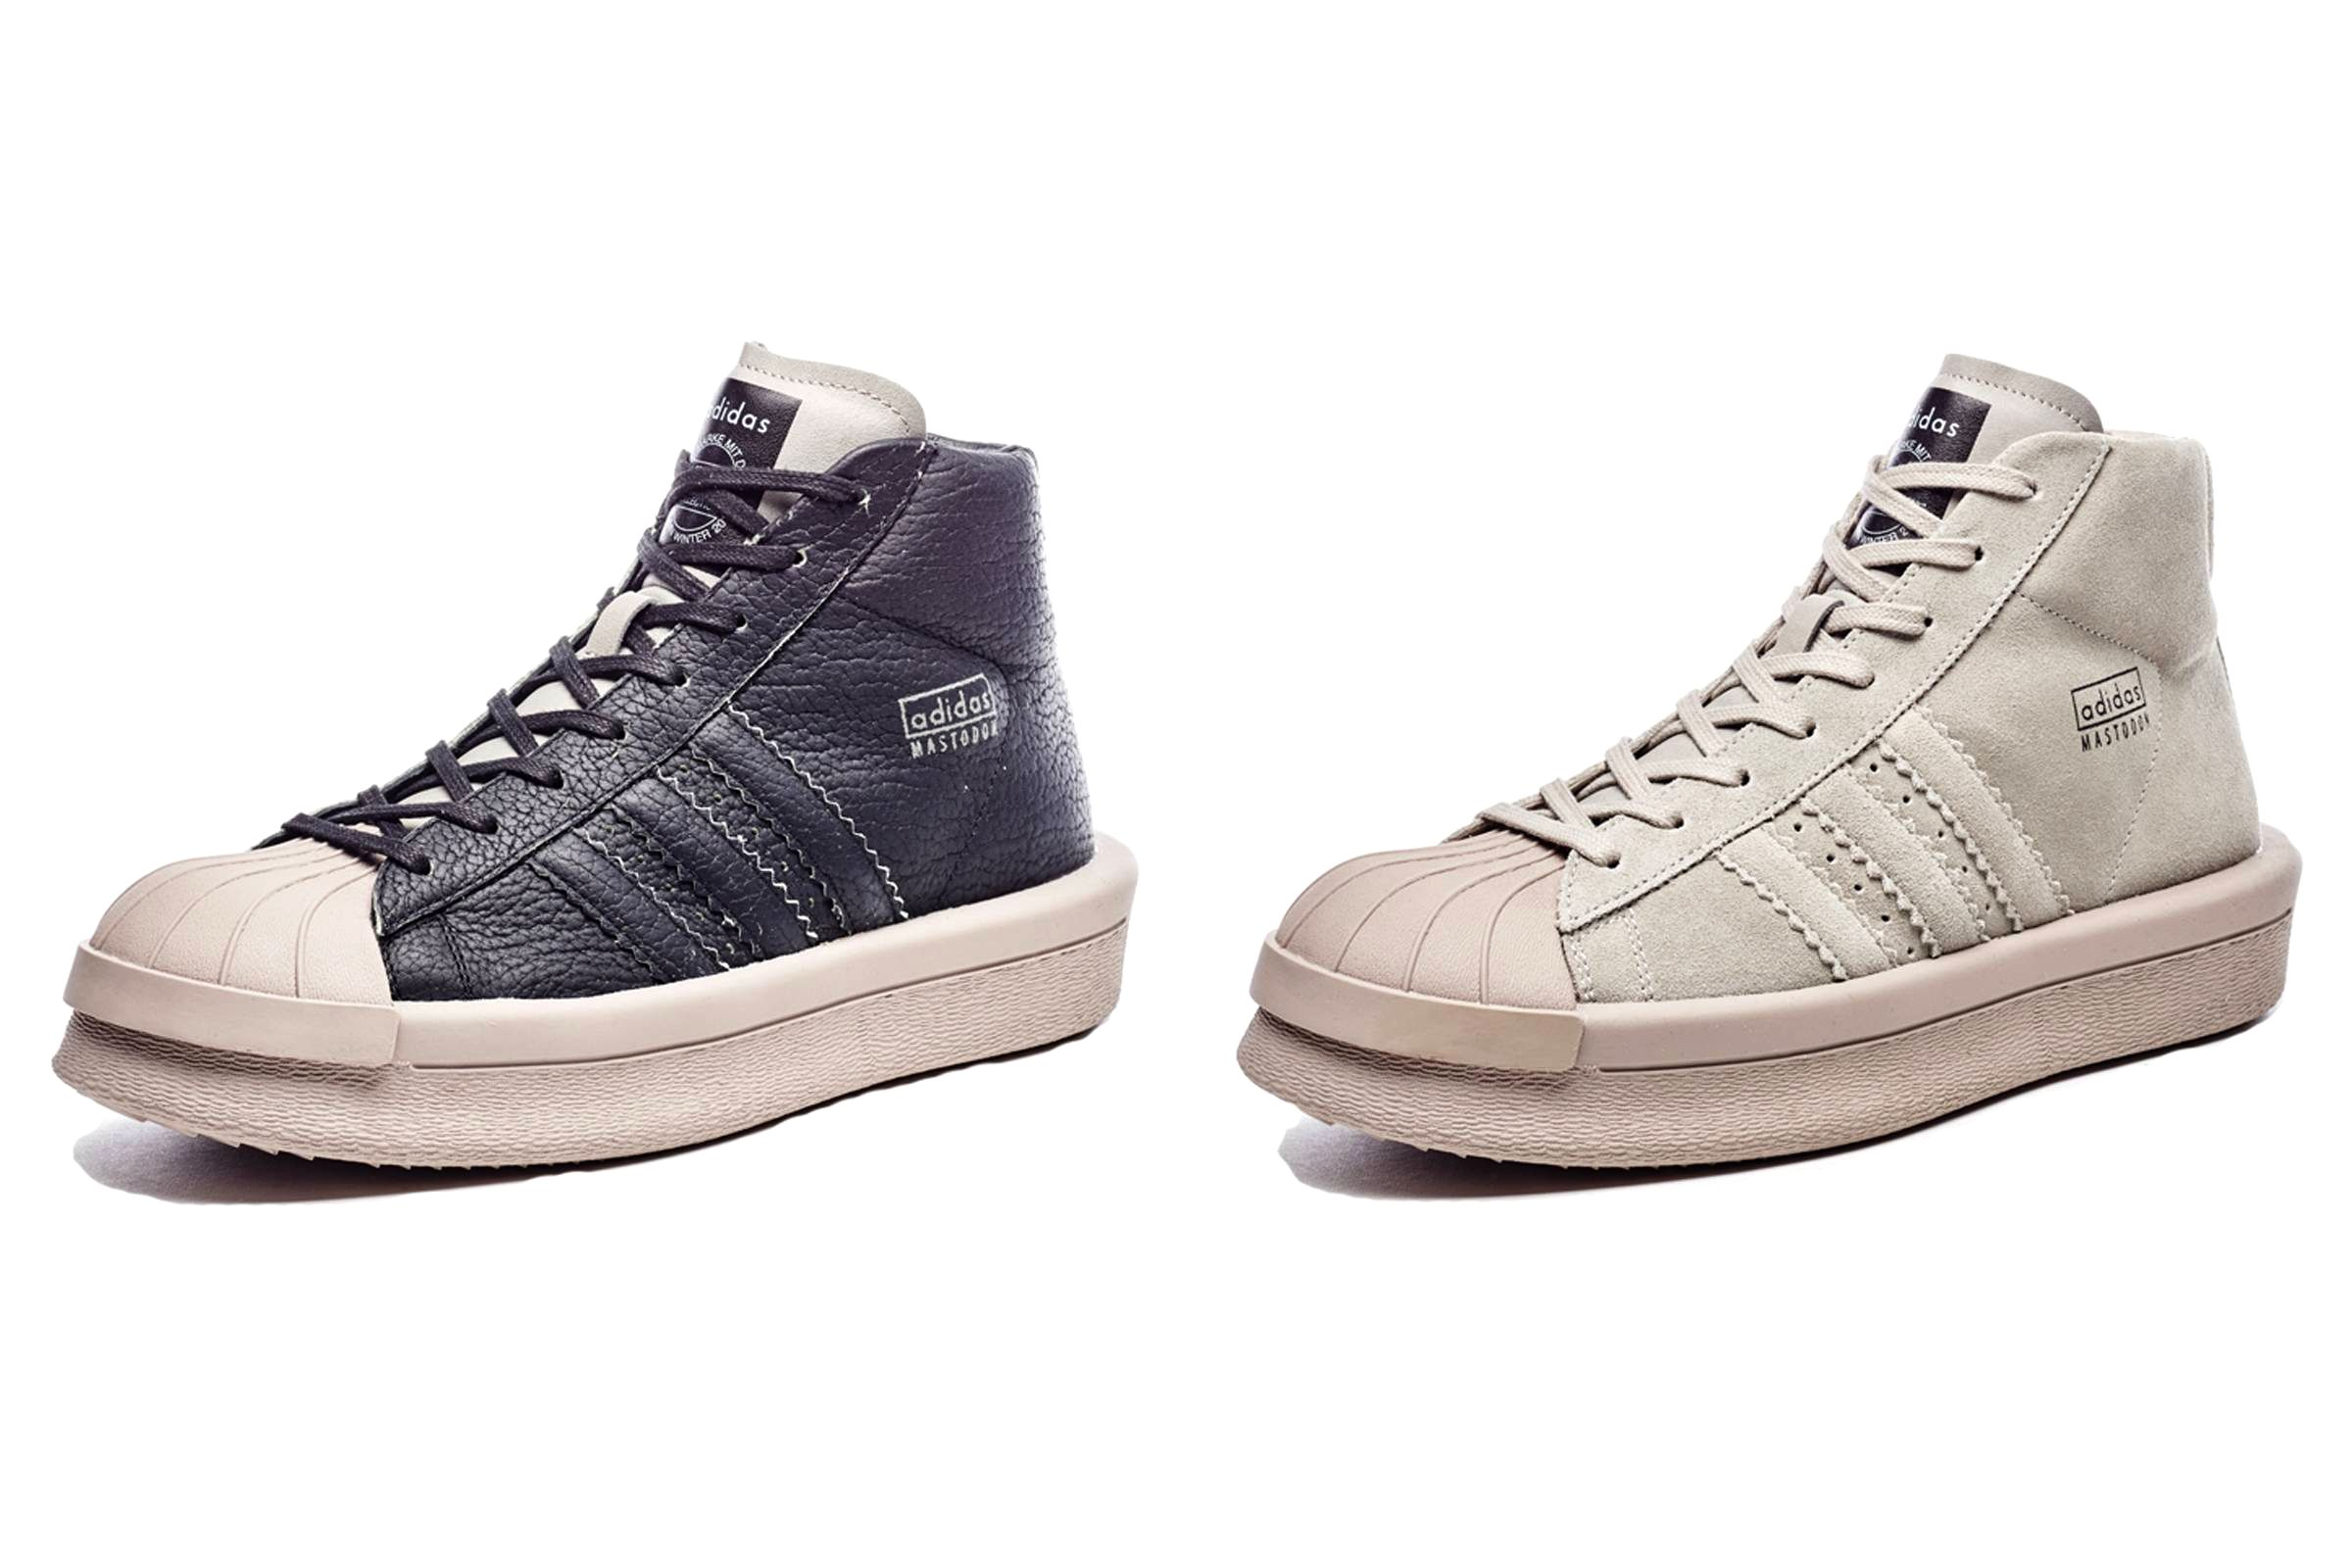 adidas by Rick Owens Mastodon Pro Fall/Winter 2016